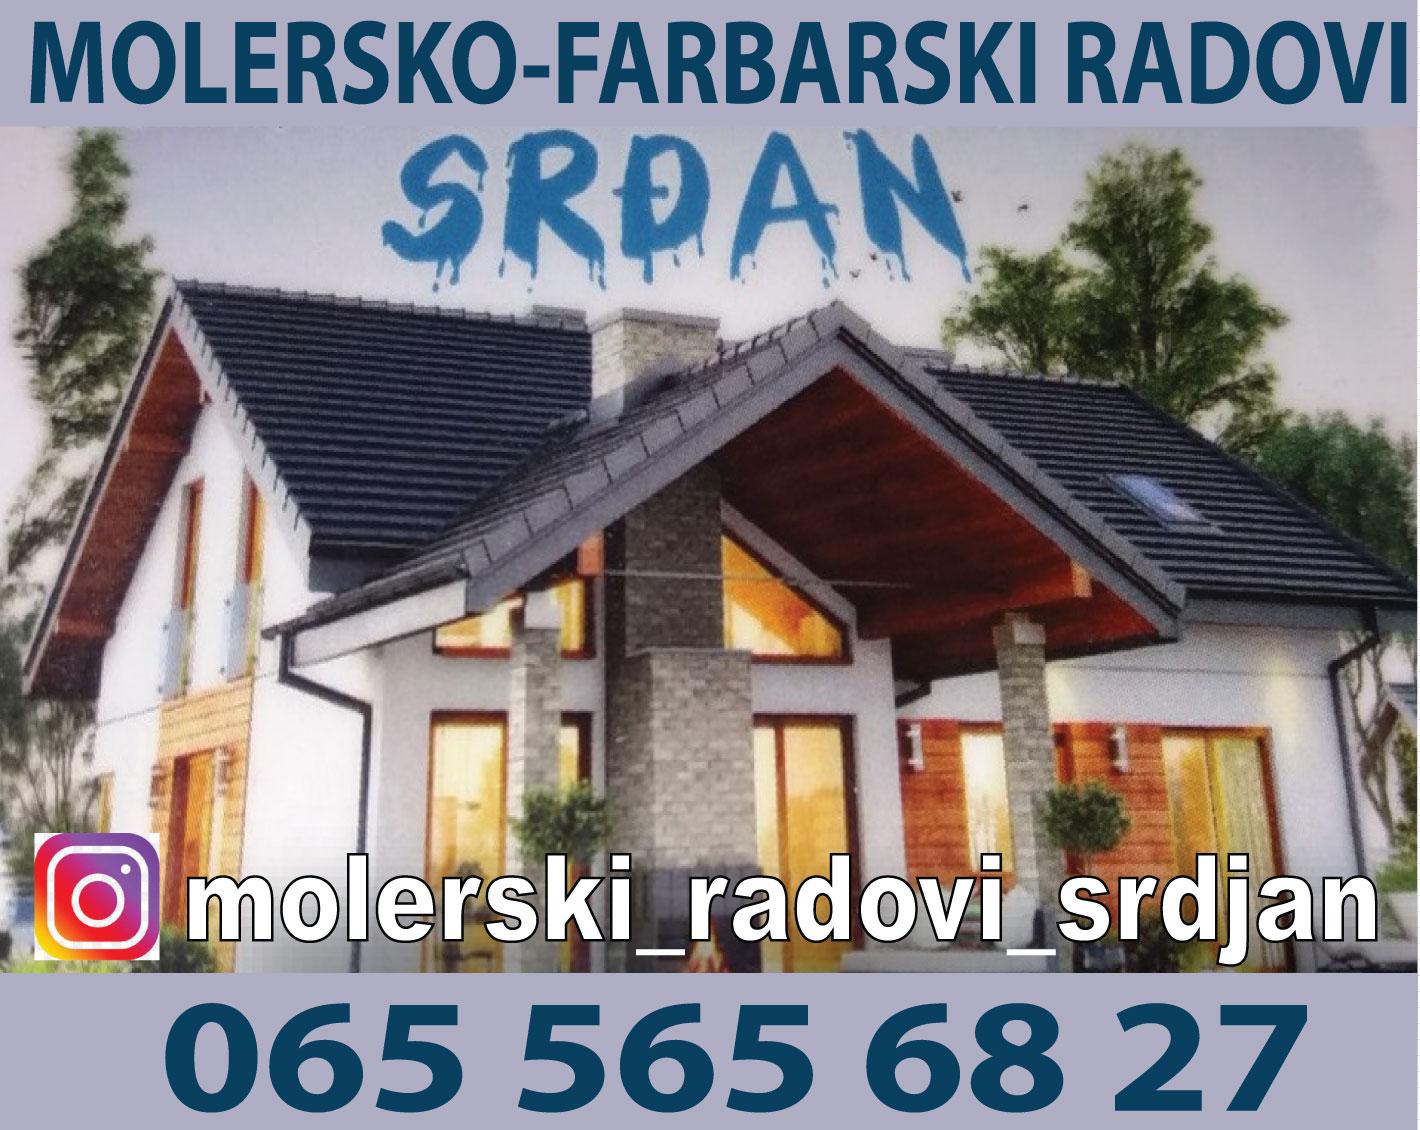 Molerski-gradjevinski-radovi-adaptacije-krecenje-izolacija-Srdjan-surcin-Beograd-mojabazaoglasi